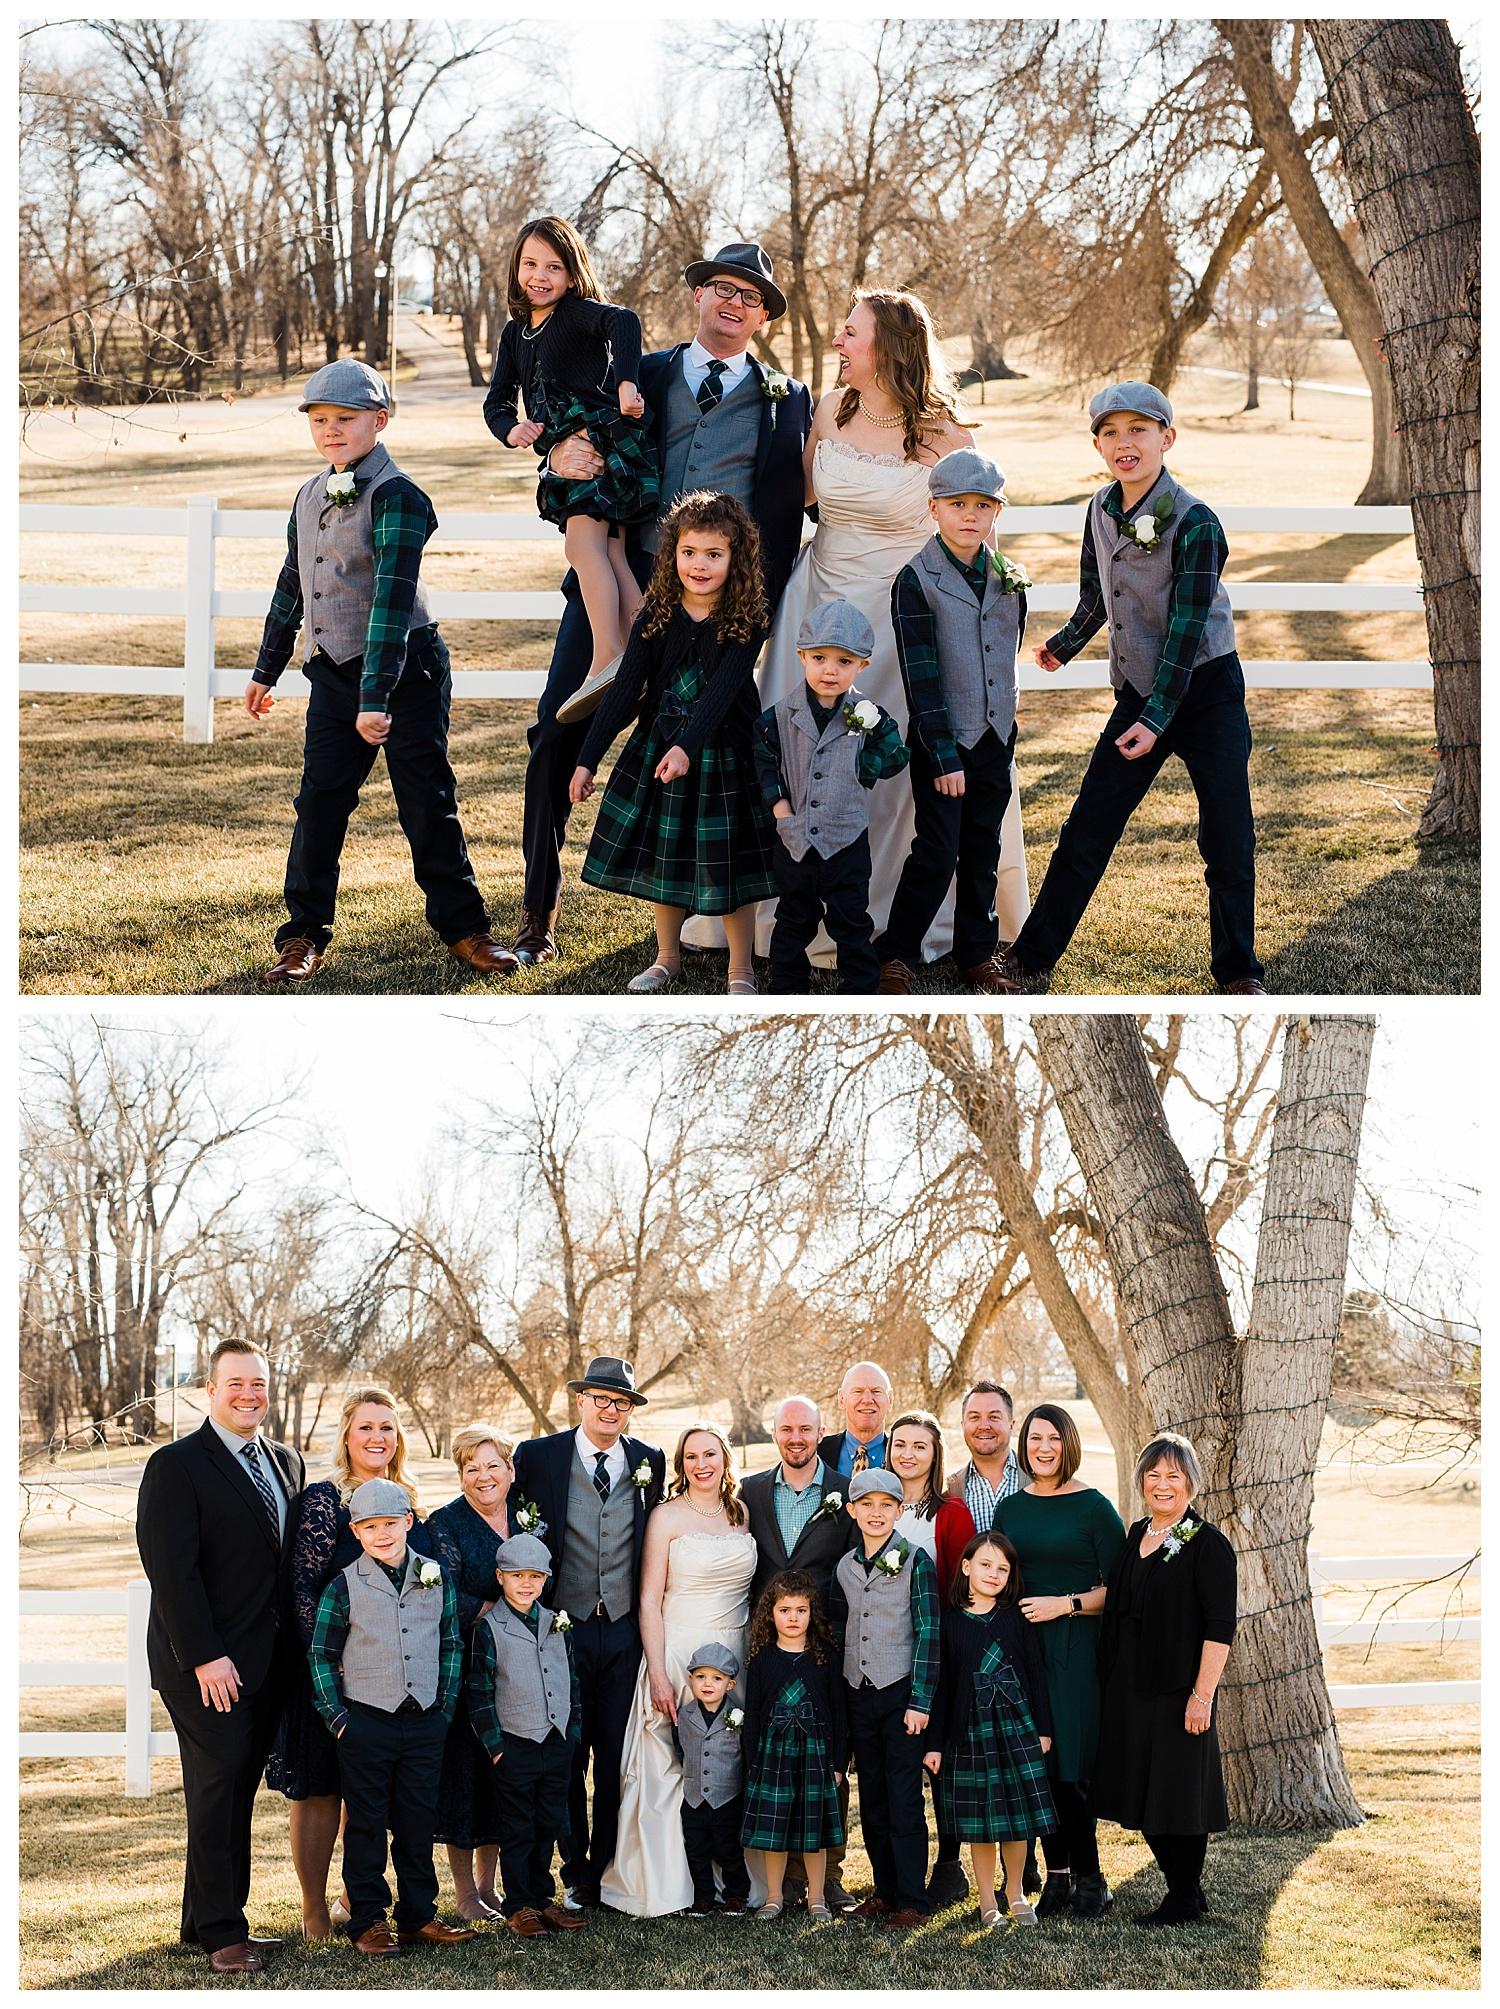 Family_Portraits_The_Barn_At_Raccoon_Creek_Wedding_Apollo_Fields_022.jpg